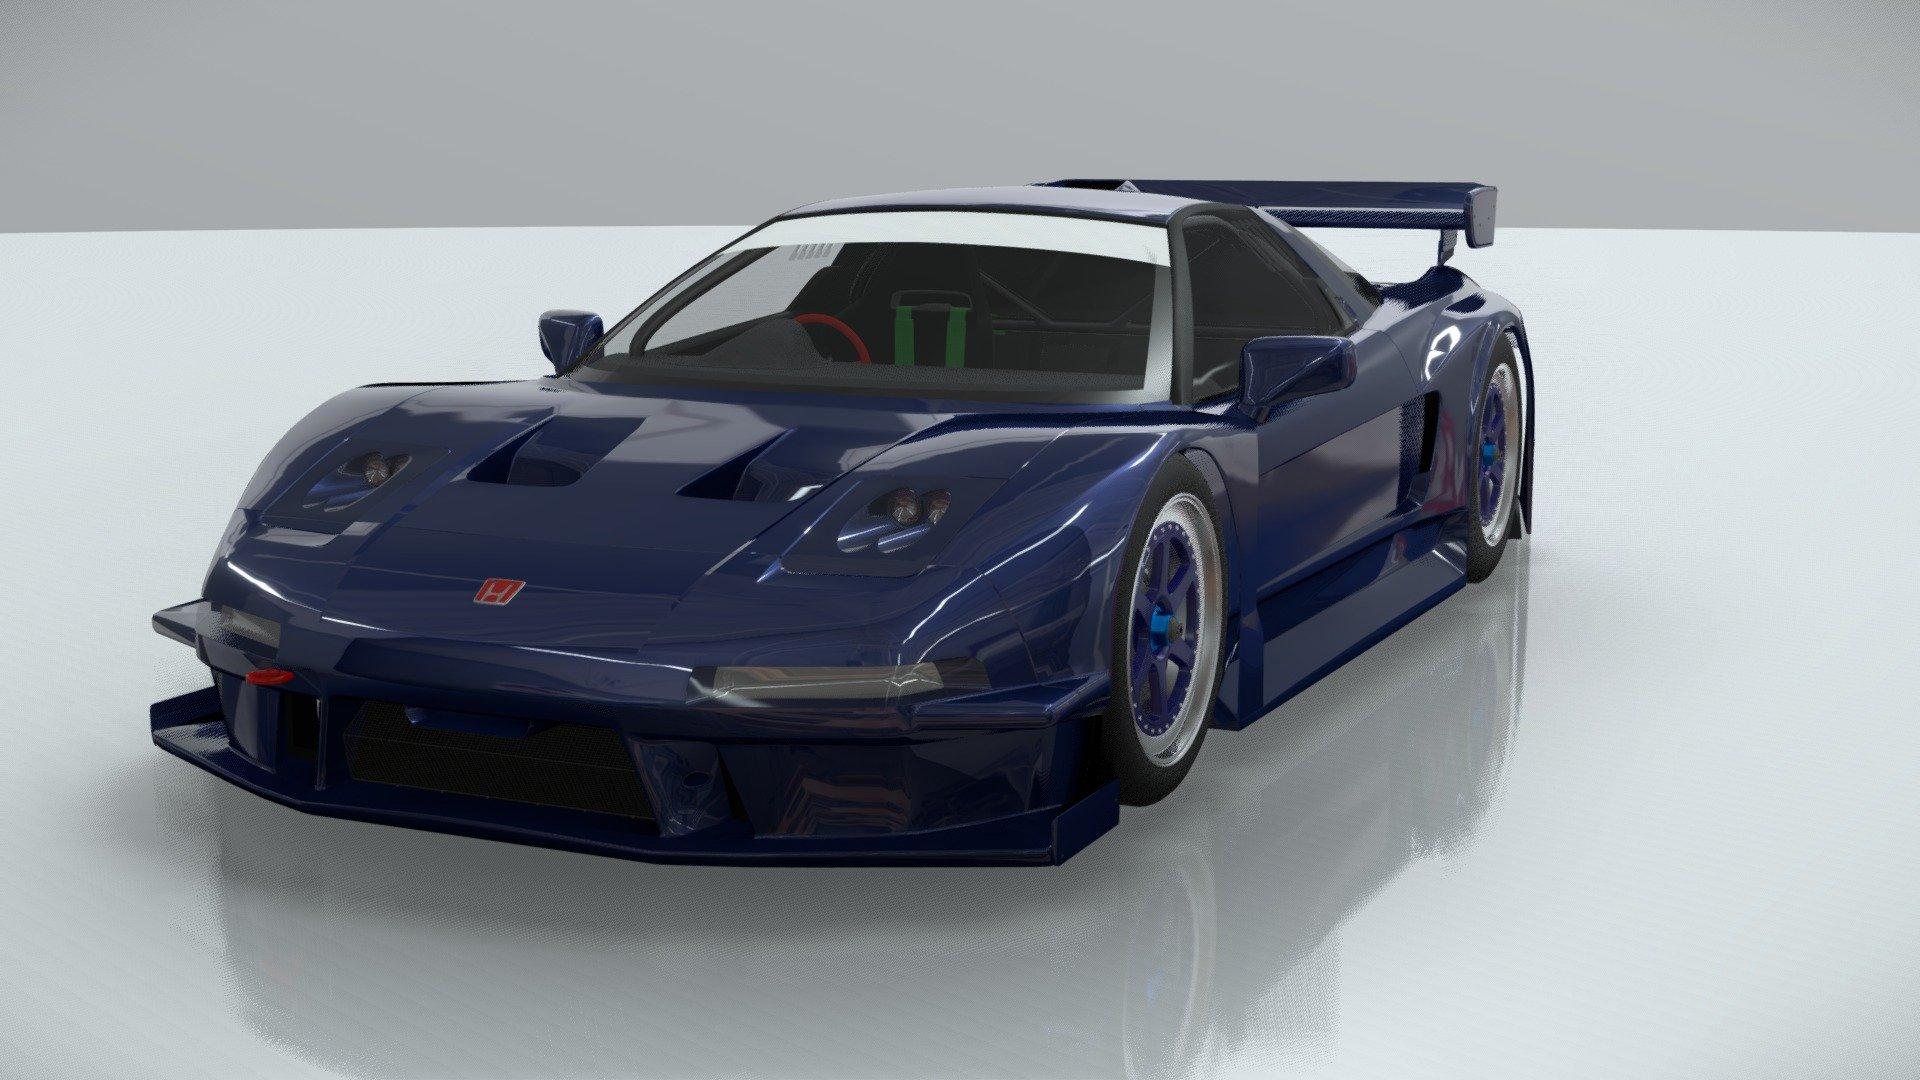 Honda NSX JGTC 1997 (WIP) - 3D model by submaniac93 (@submaniac93) 420ac63 - Sketchfab